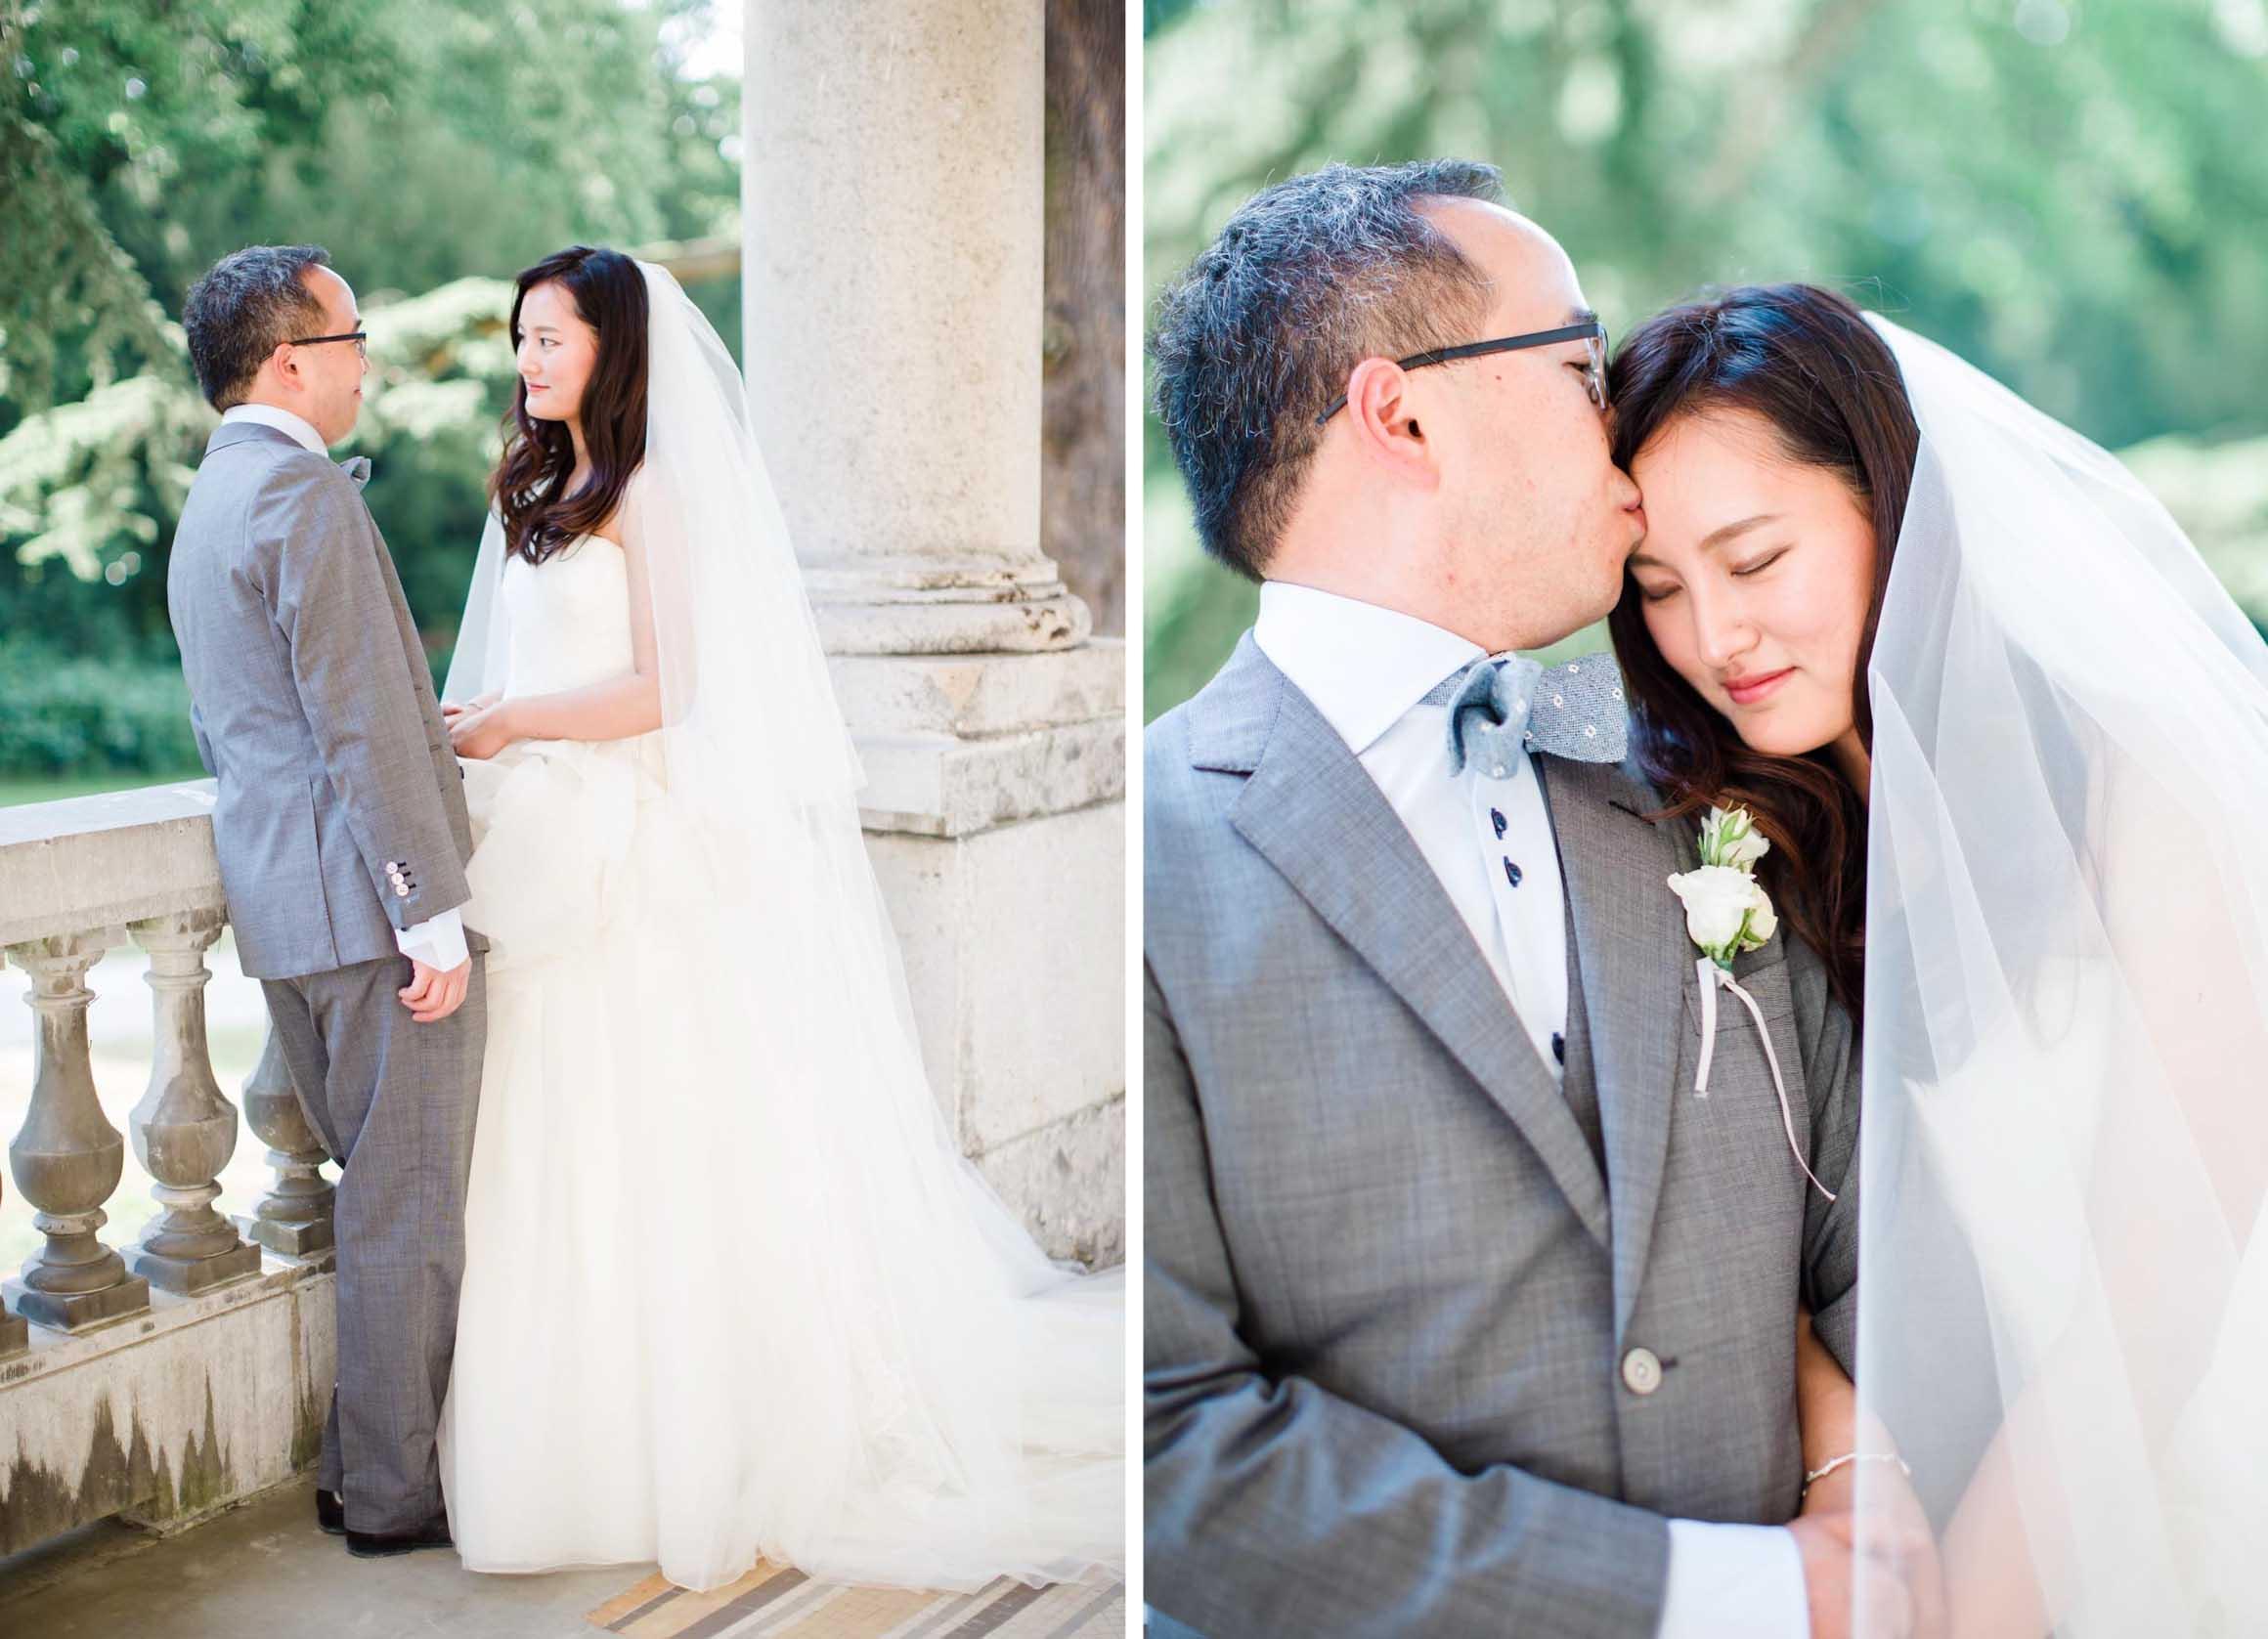 Amy O'Boyle Photography- Chateau Bouffemont Wedding- France Wedding Photographer 9.jpg